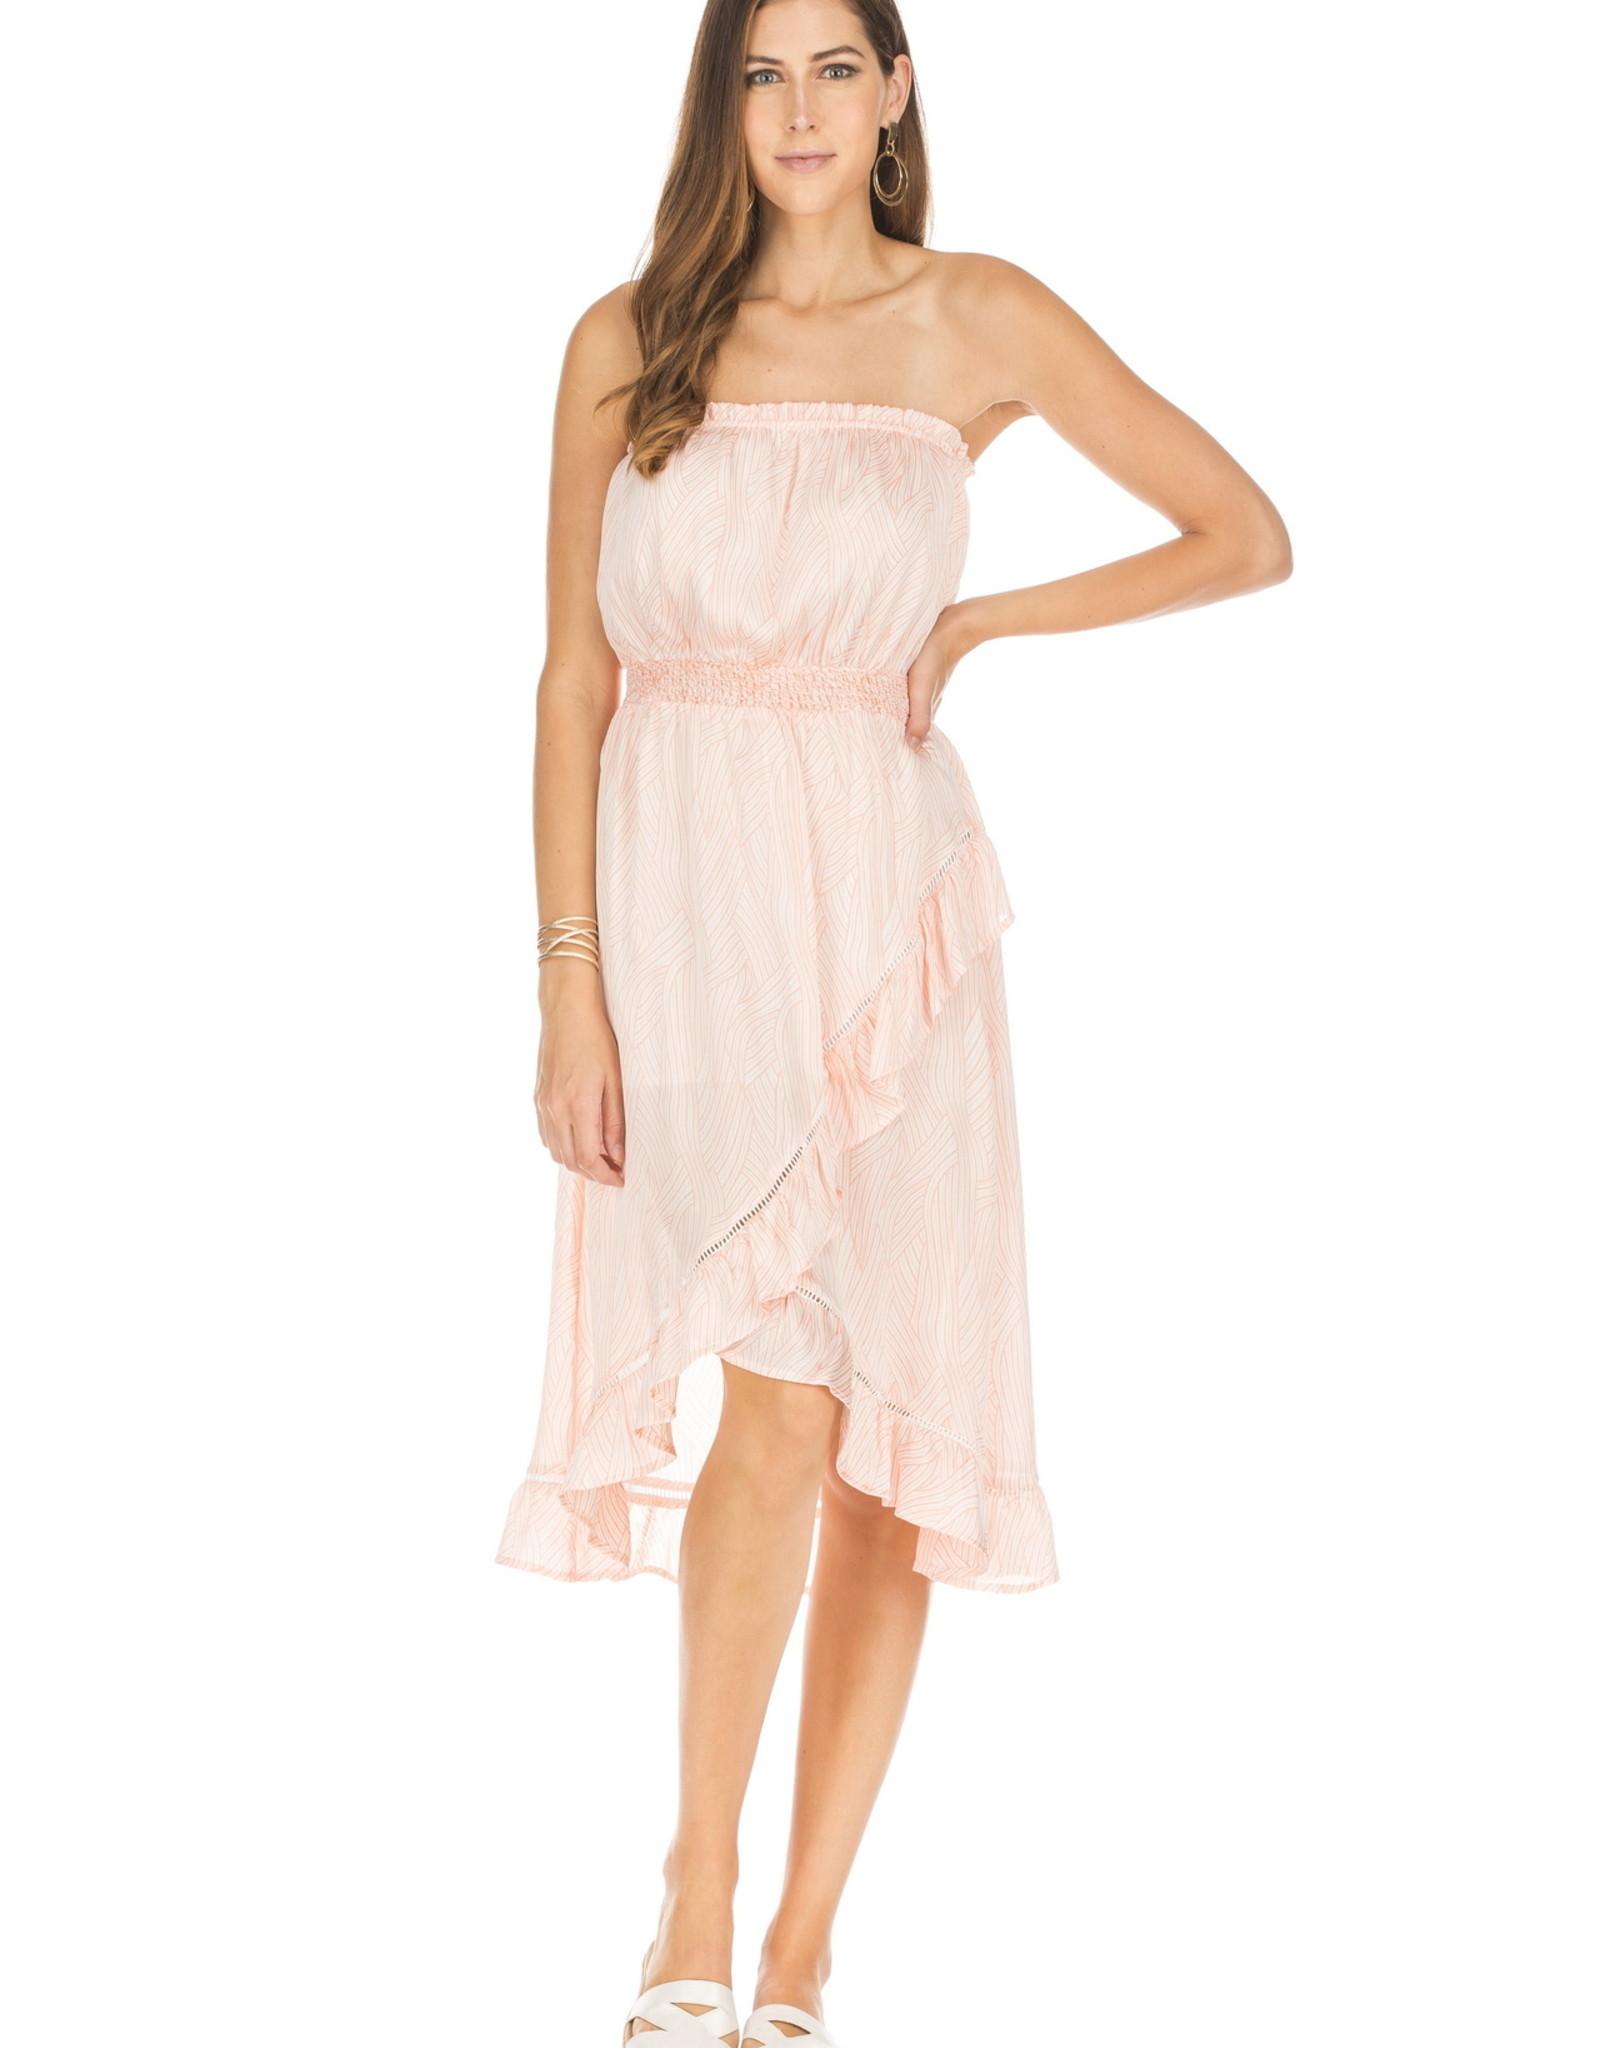 Jade Peachy Wave Strapless High Low Dress